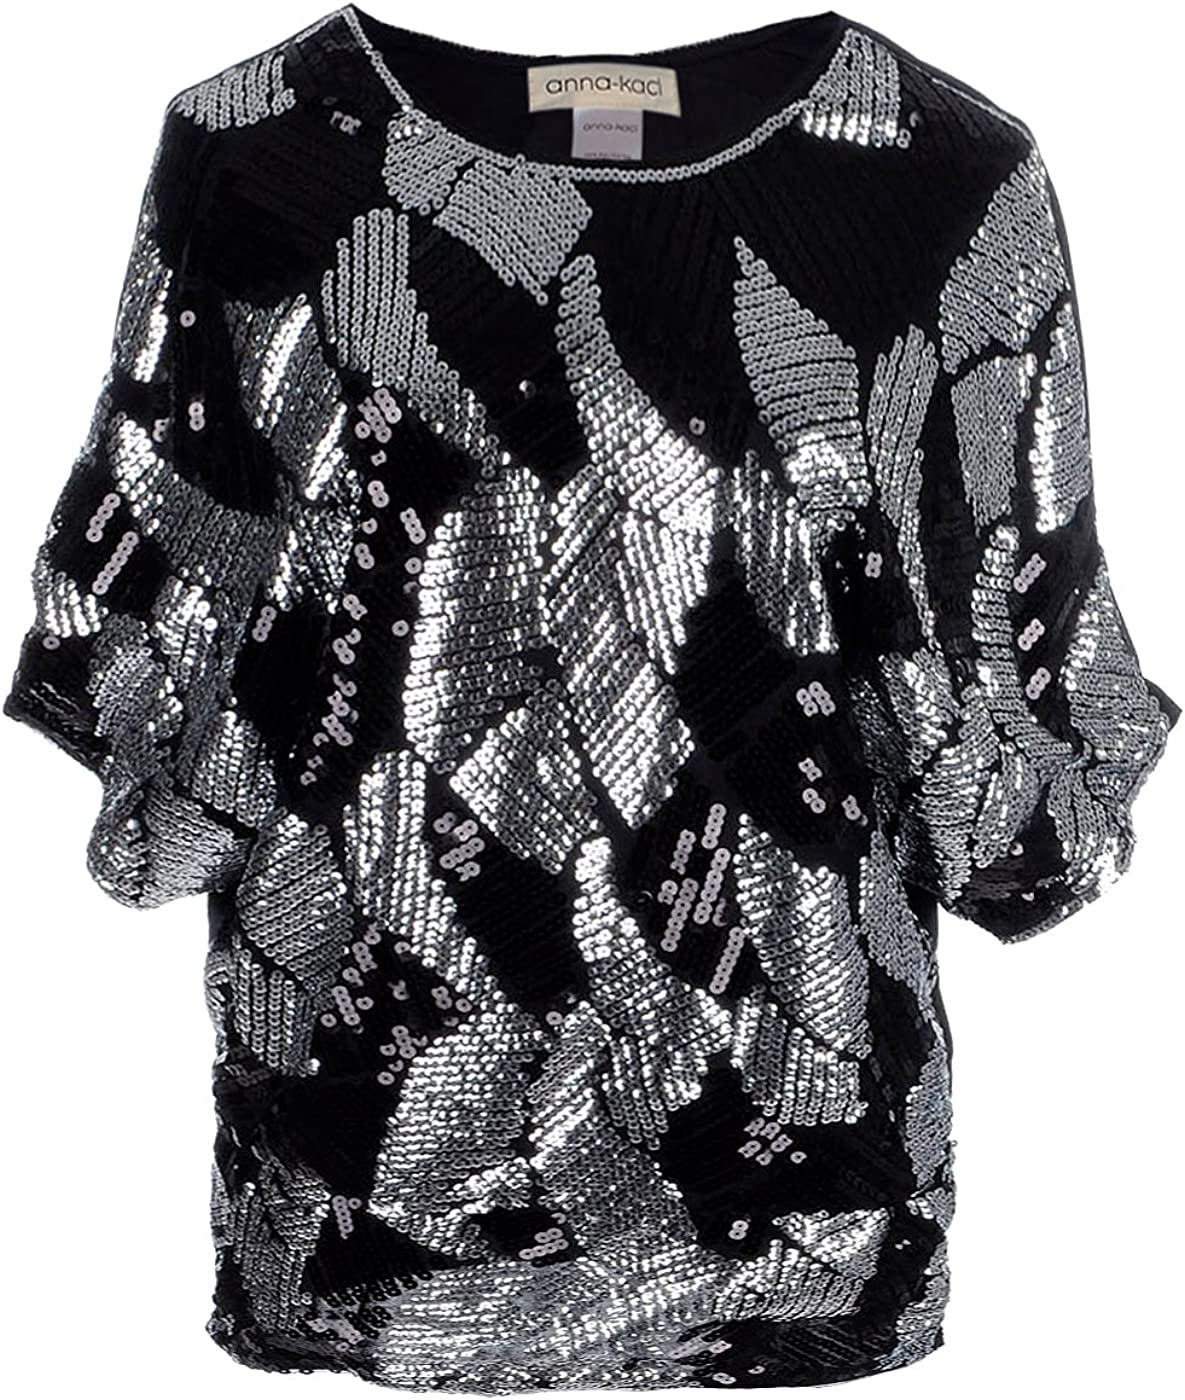 Black Sequin Bling Shiny Tank Top Cut Out Cold Shoulder T Shirt Blouse Evening